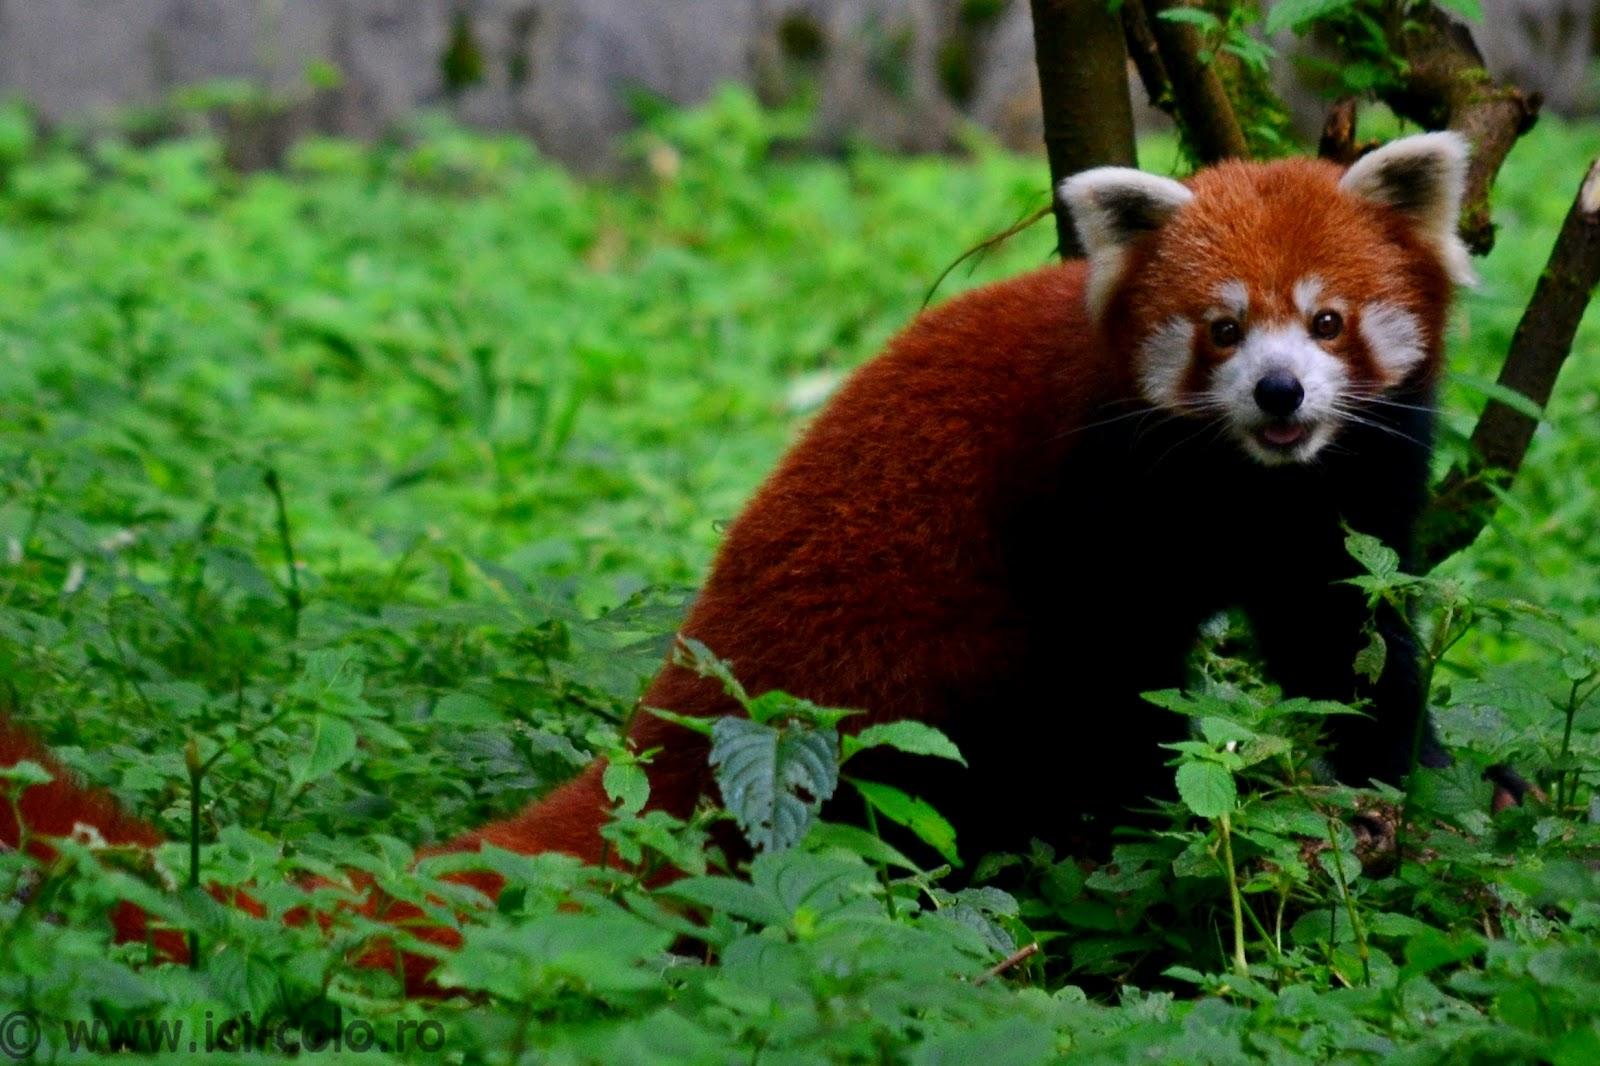 http://1.bp.blogspot.com/-_iCx8kSDNnc/UEbV6FshTgI/AAAAAAAAEjA/_RP0i5ppnx4/s1600/Darjeeling_Zoo_Himalaya_ici-colo_DSC_0015_cr.jpg